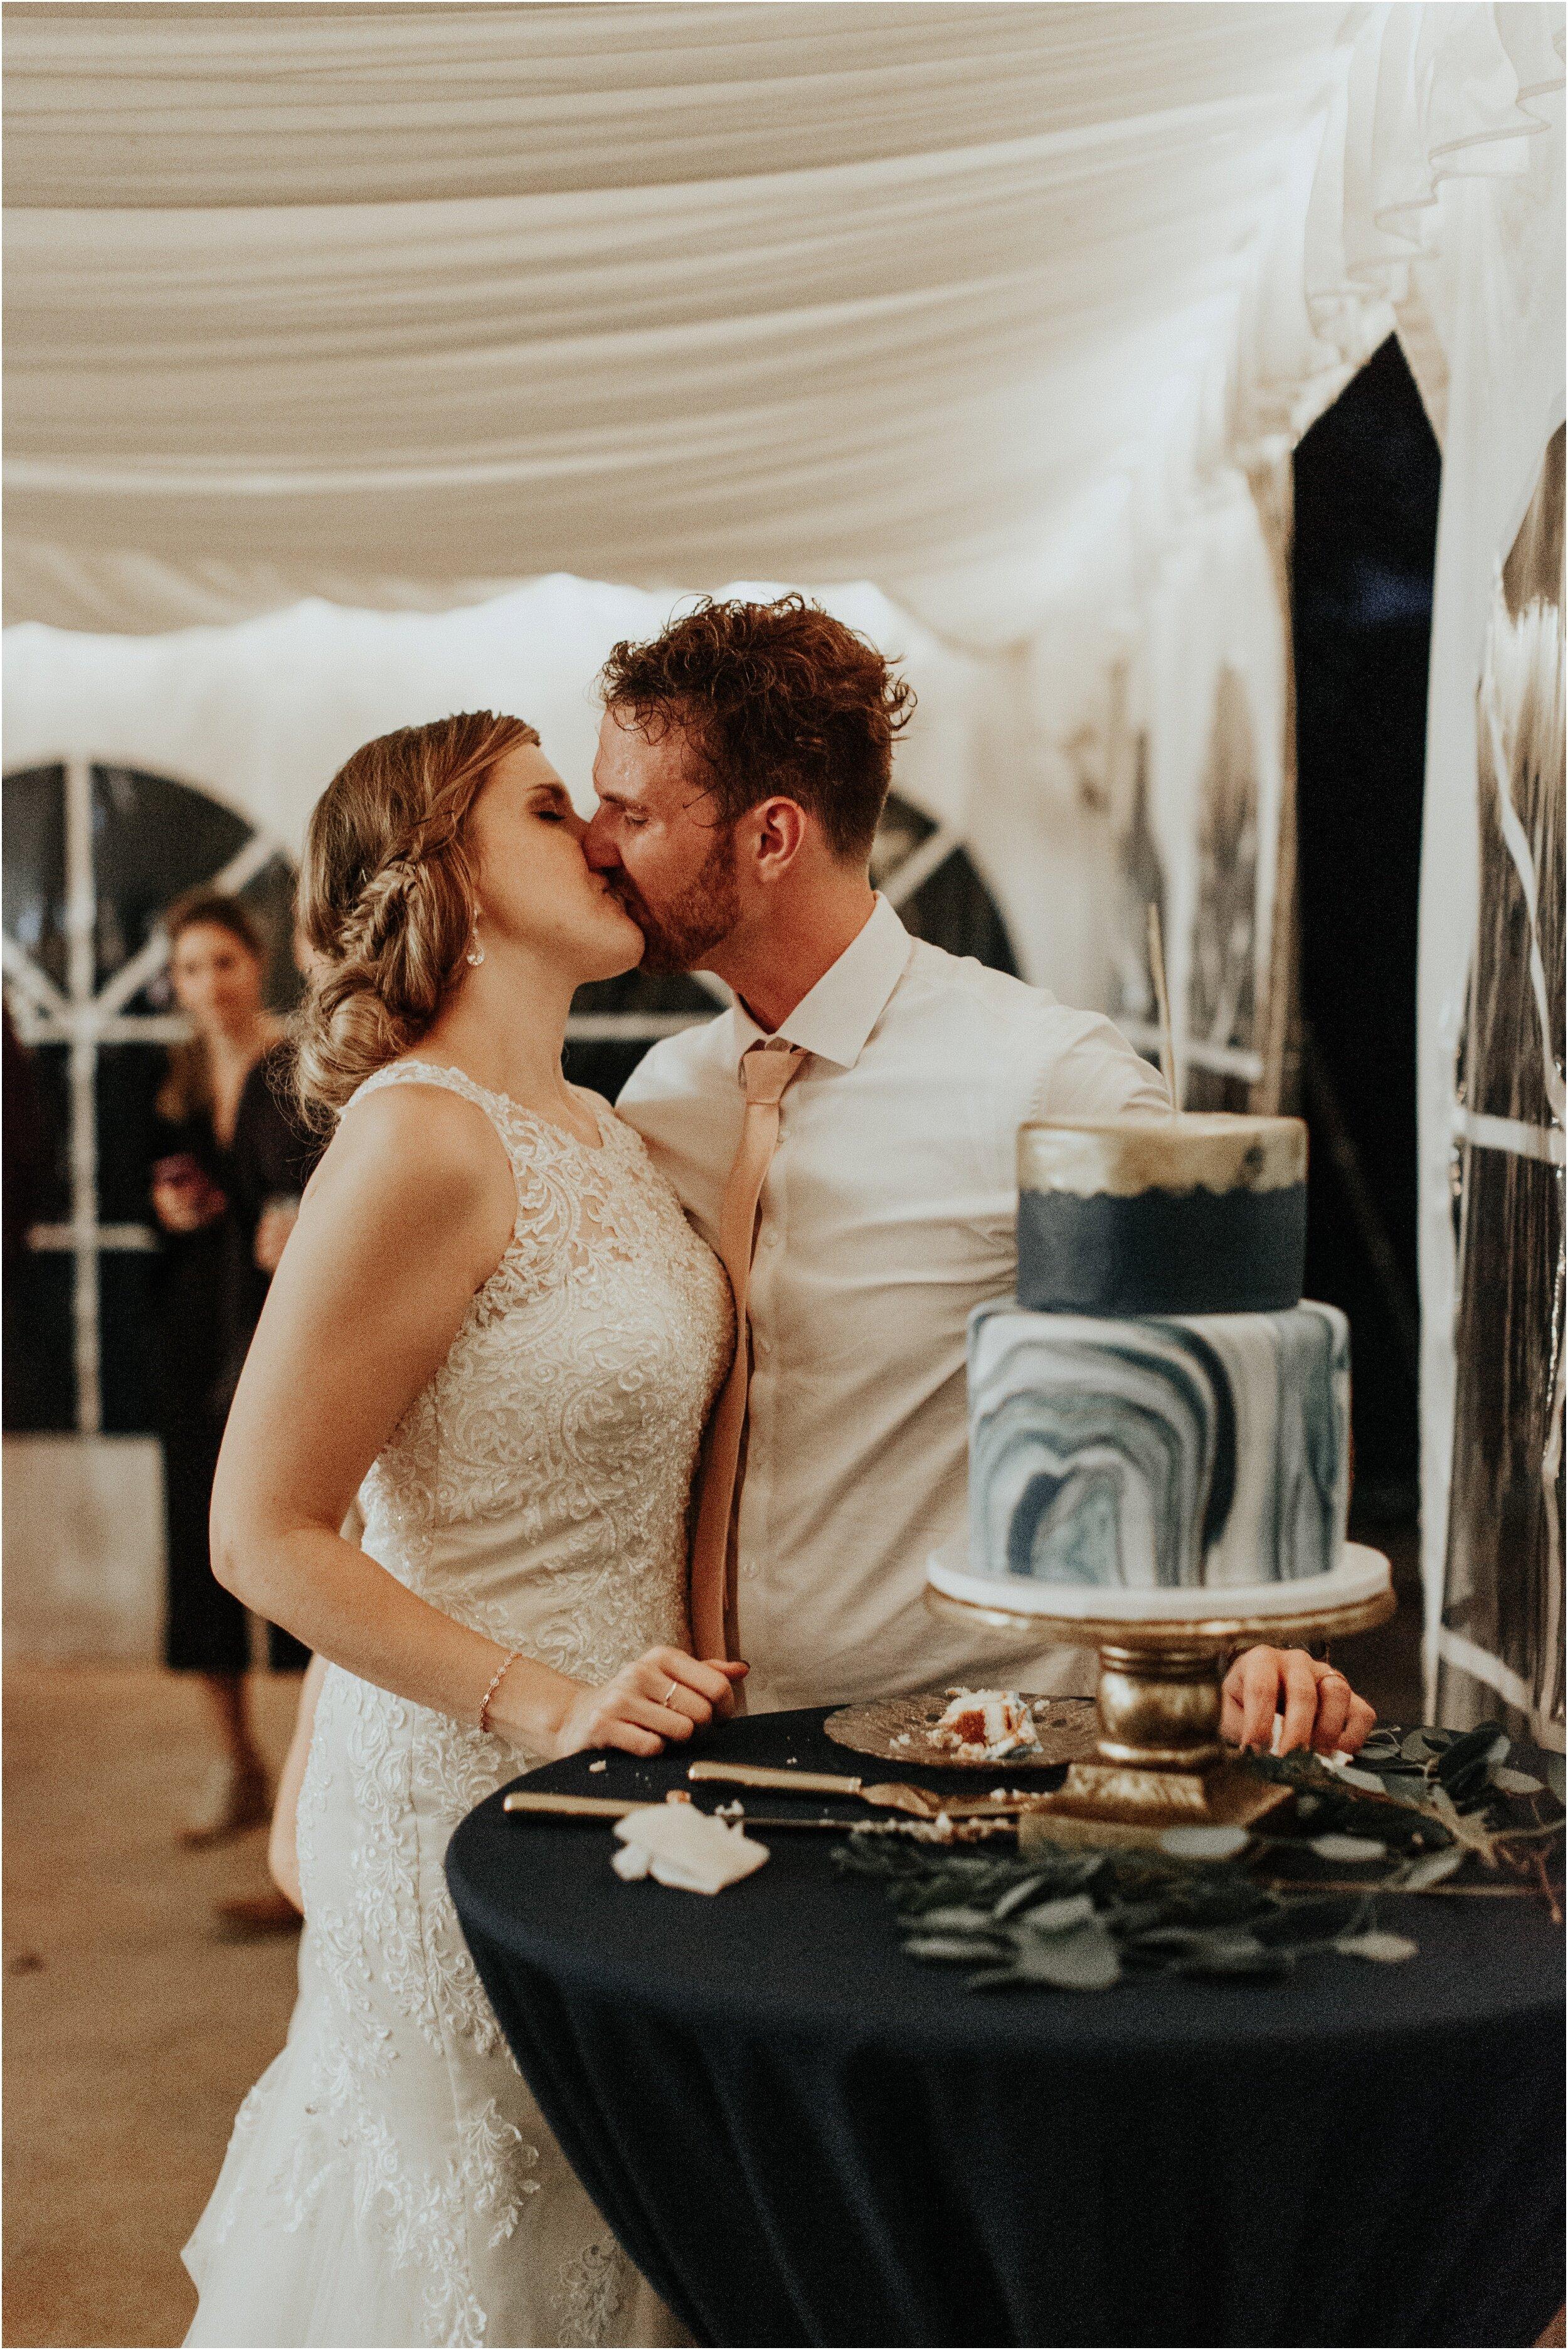 steph-and-jordan-cox-our-wedding-historic-shady-lane-compass-wedding-collective-hazel-lining-photography-destination-elopement-wedding-engagement-photography_0097.jpg